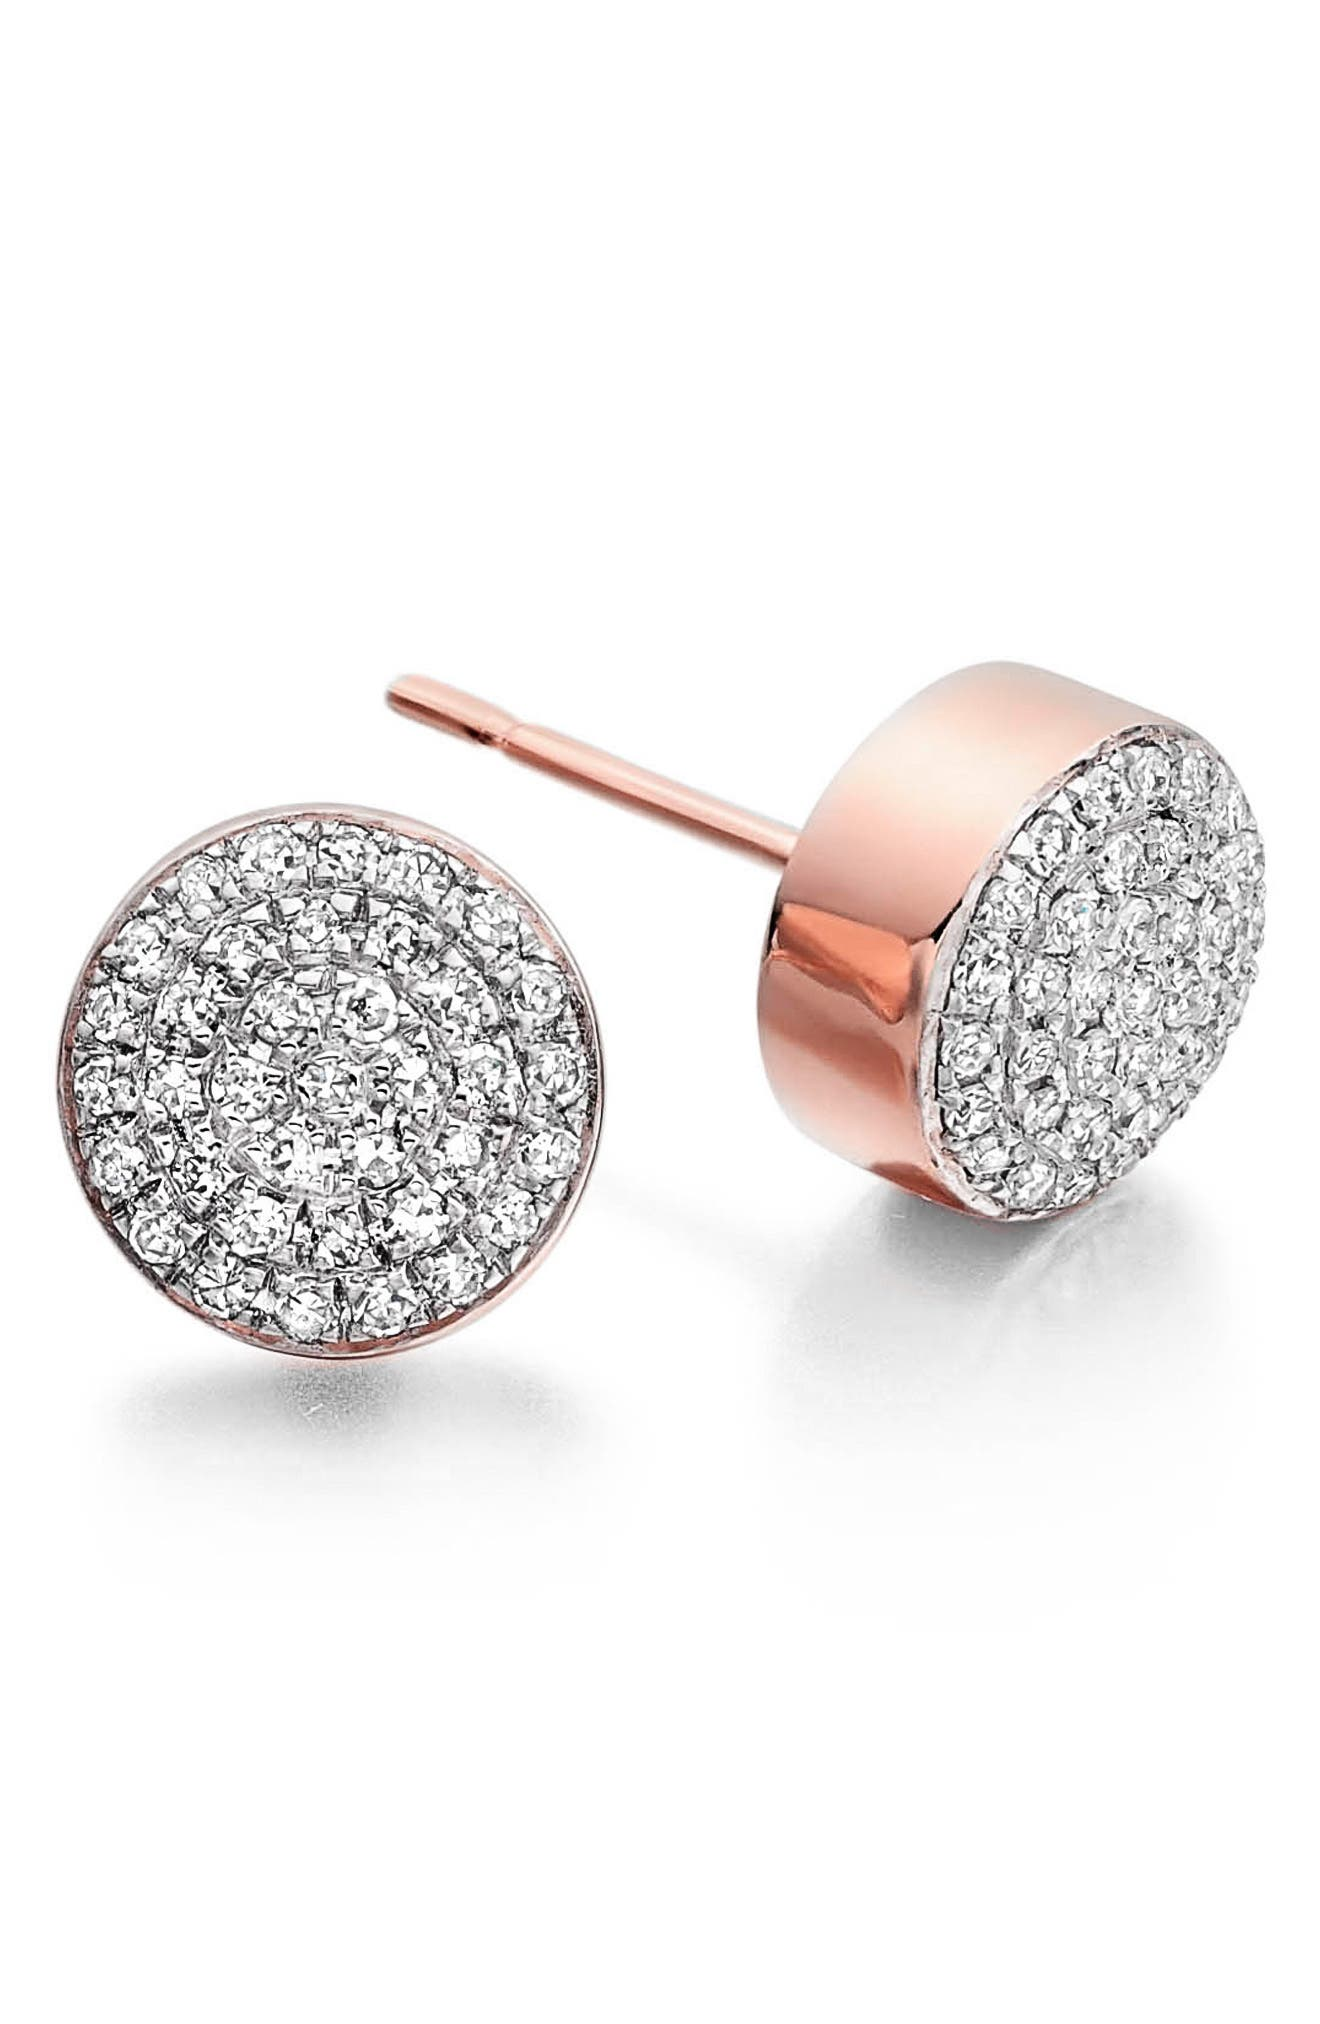 MONICA VINADER, 'Ava' Diamond Button Stud Earrings, Main thumbnail 1, color, ROSE GOLD